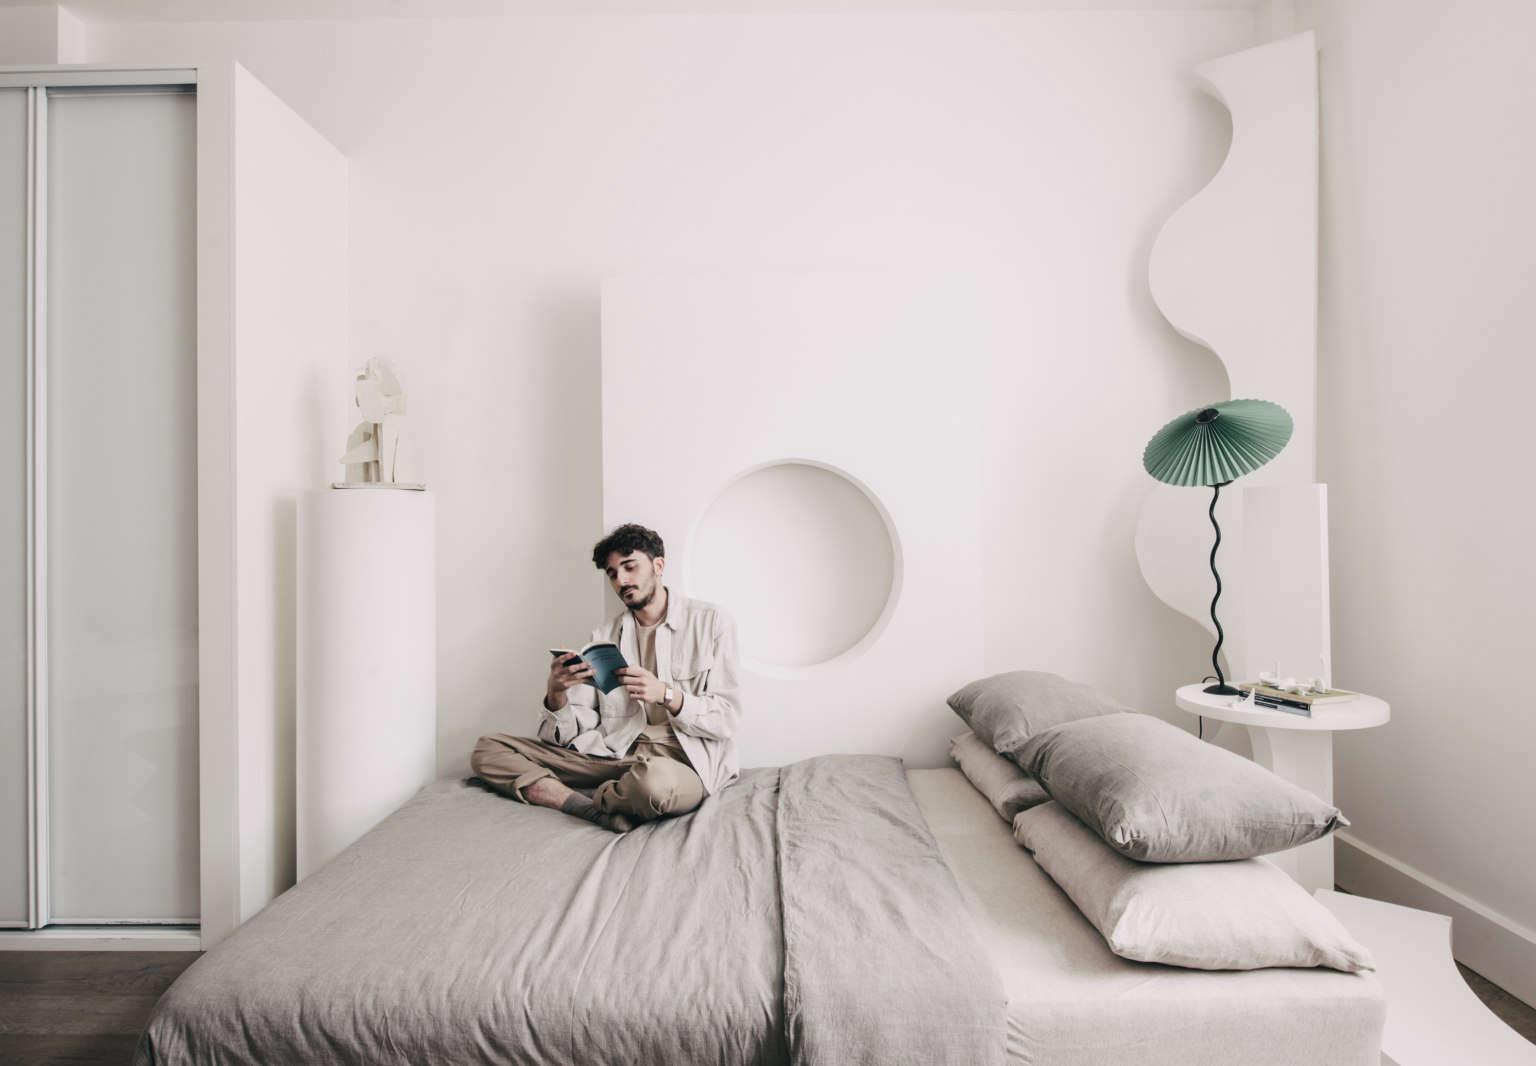 designer oscar piccolo at home london via the modern house 7